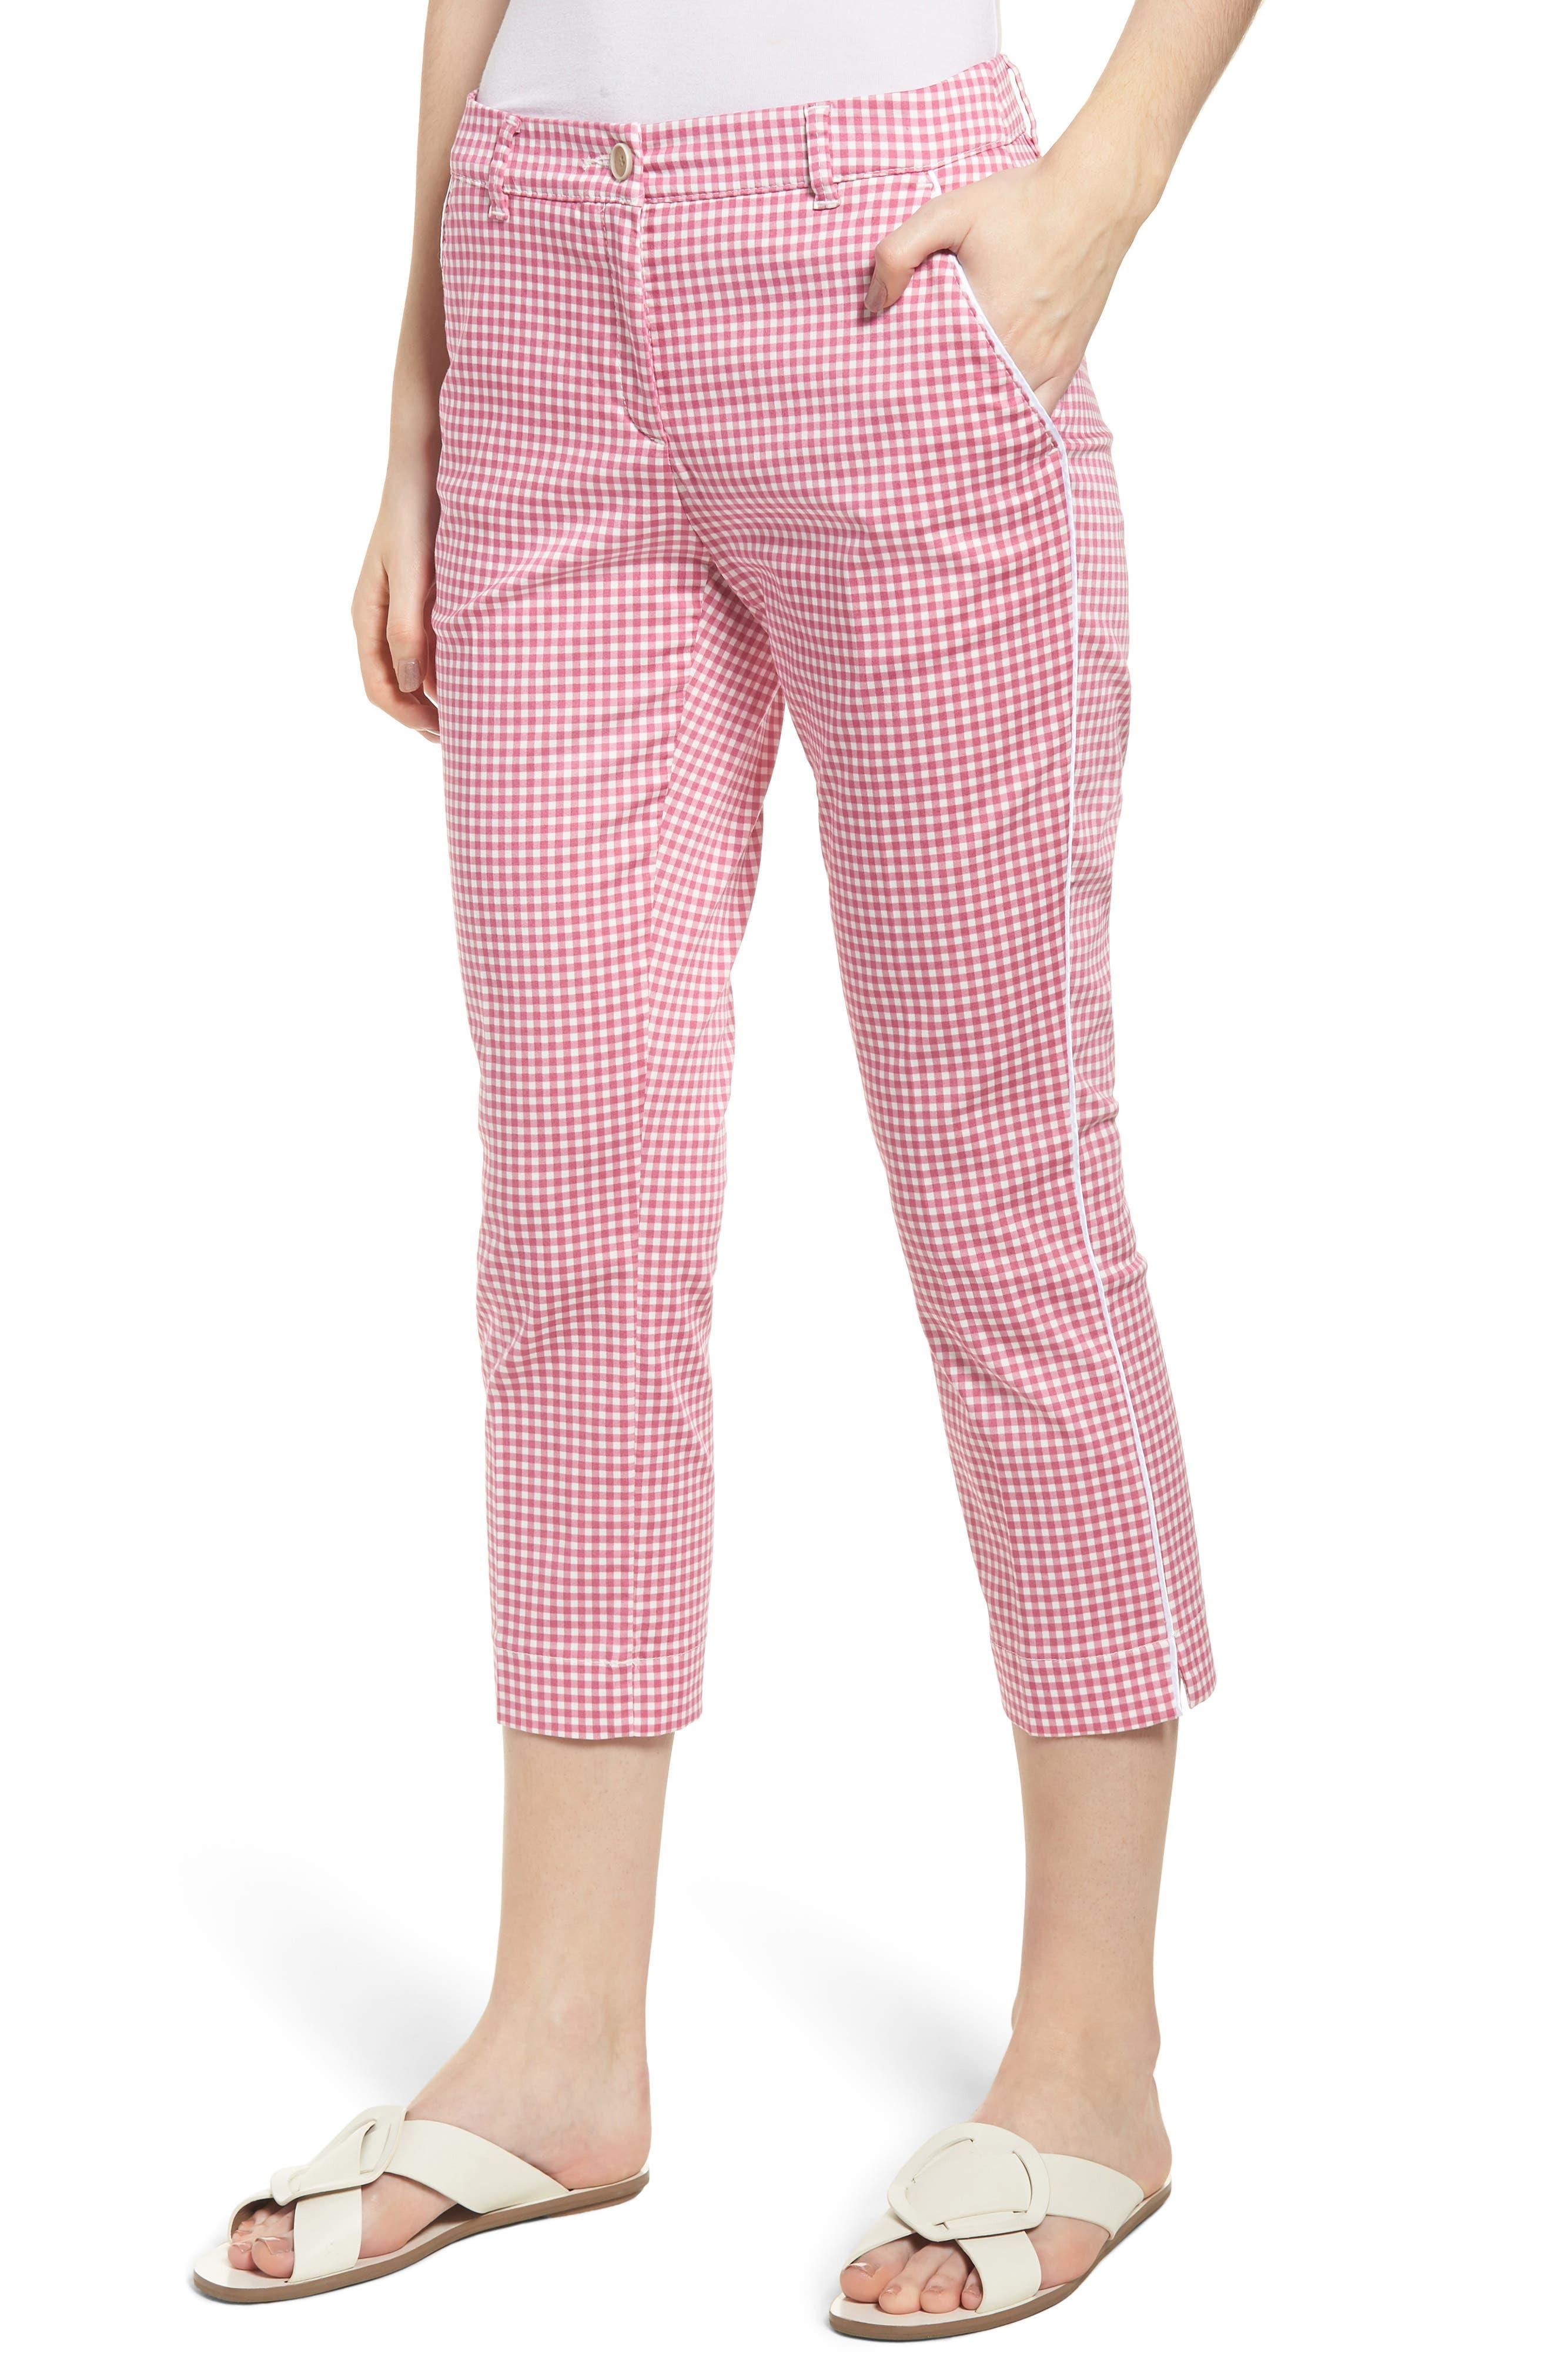 Maron Gingham Stretch Cotton Pants,                         Main,                         color, Pink